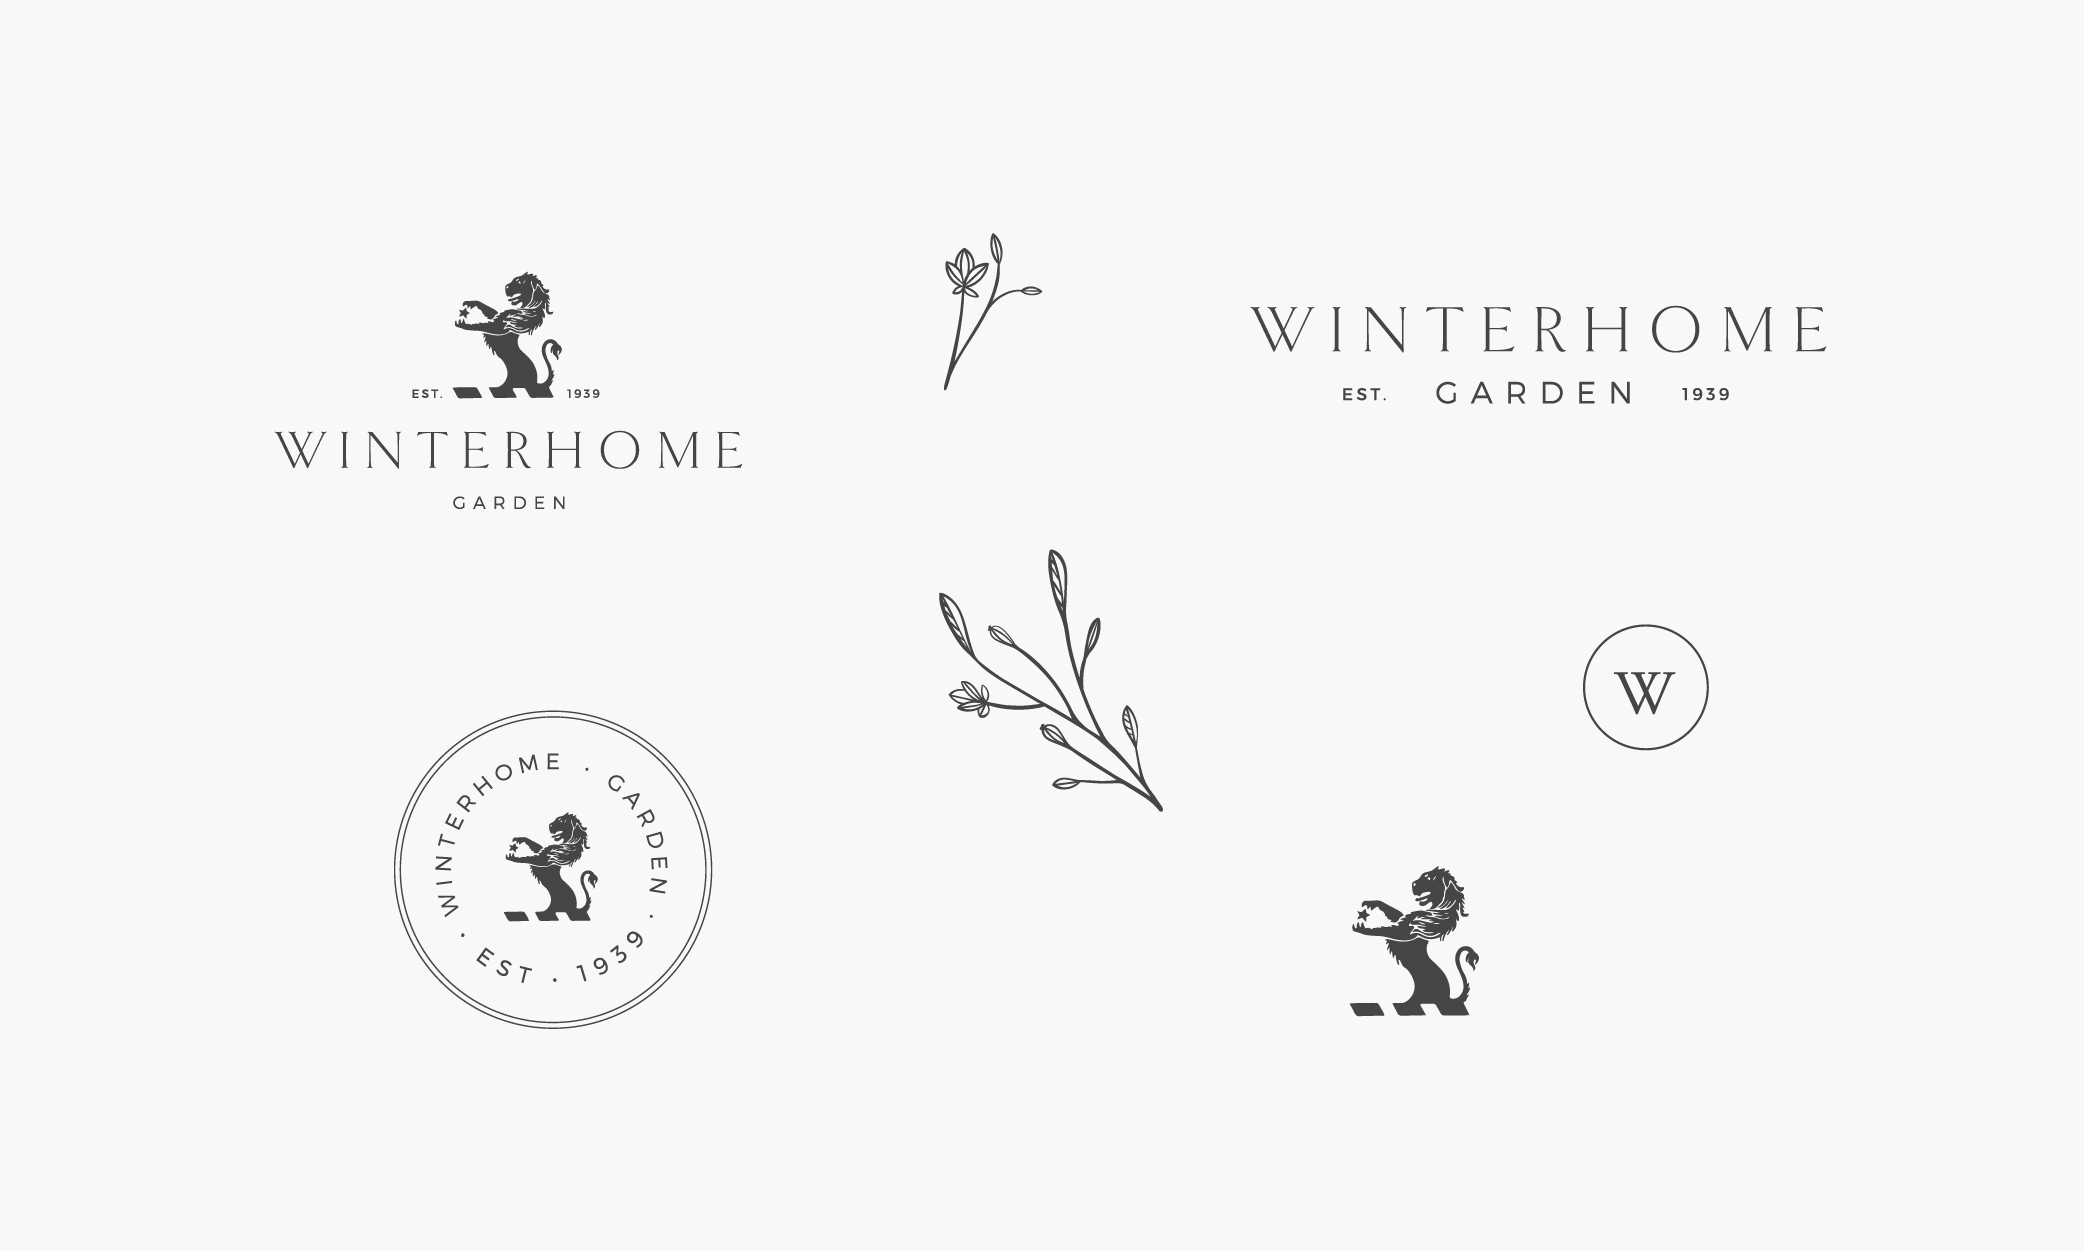 Winterhome Garden logo set